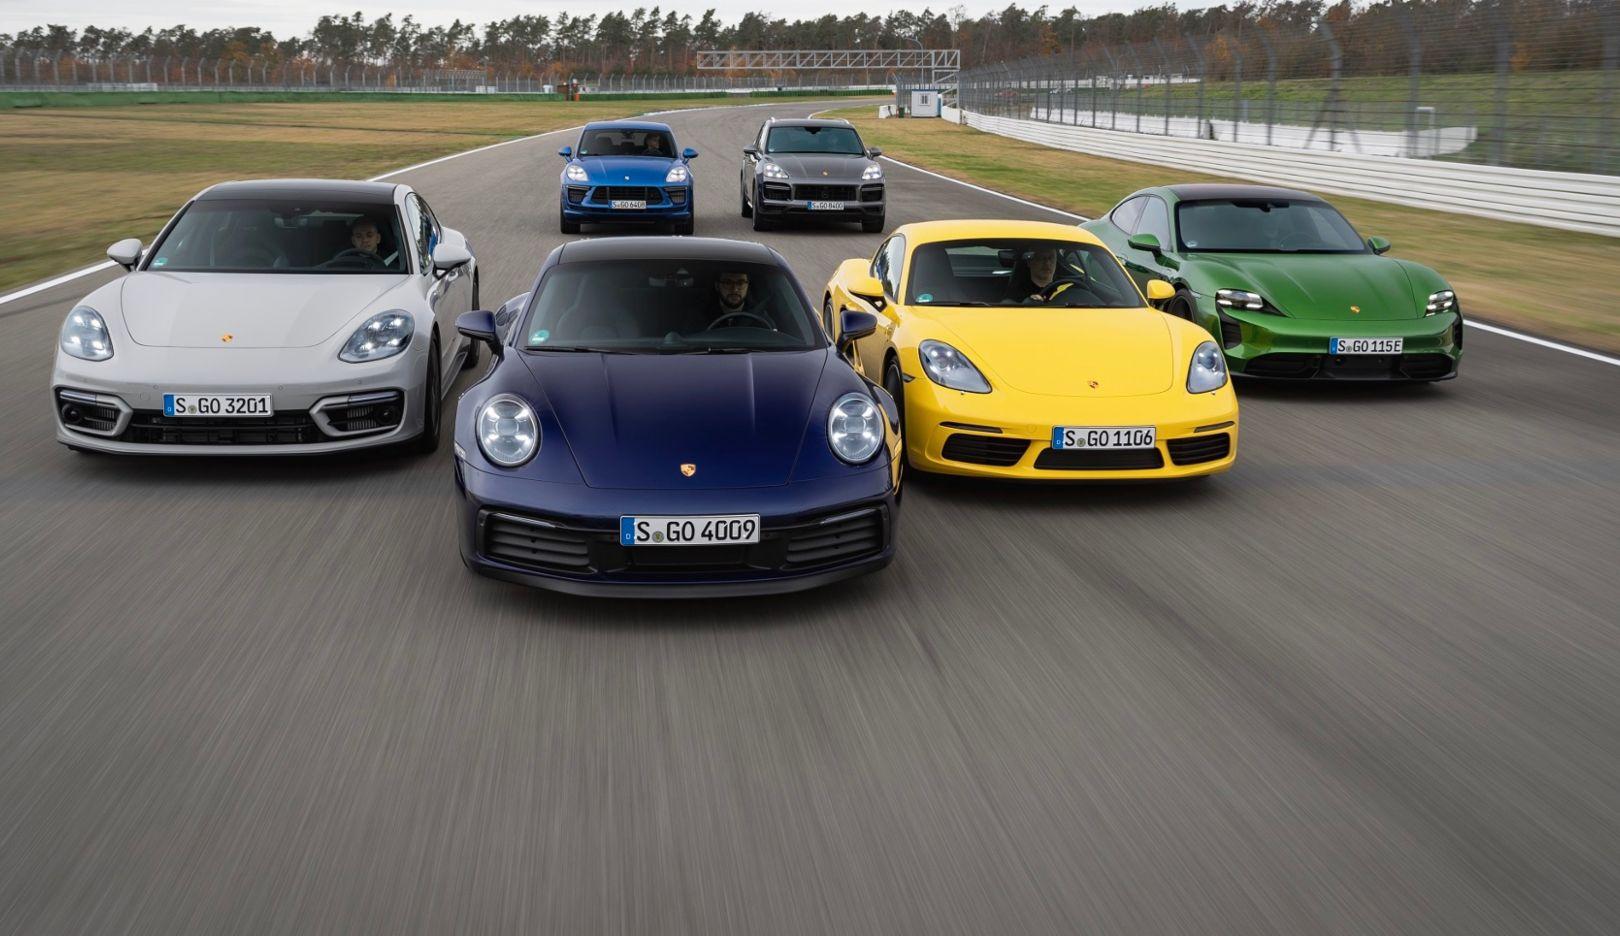 Porsche delivered 272,162 new vehicles worldwide in 2020